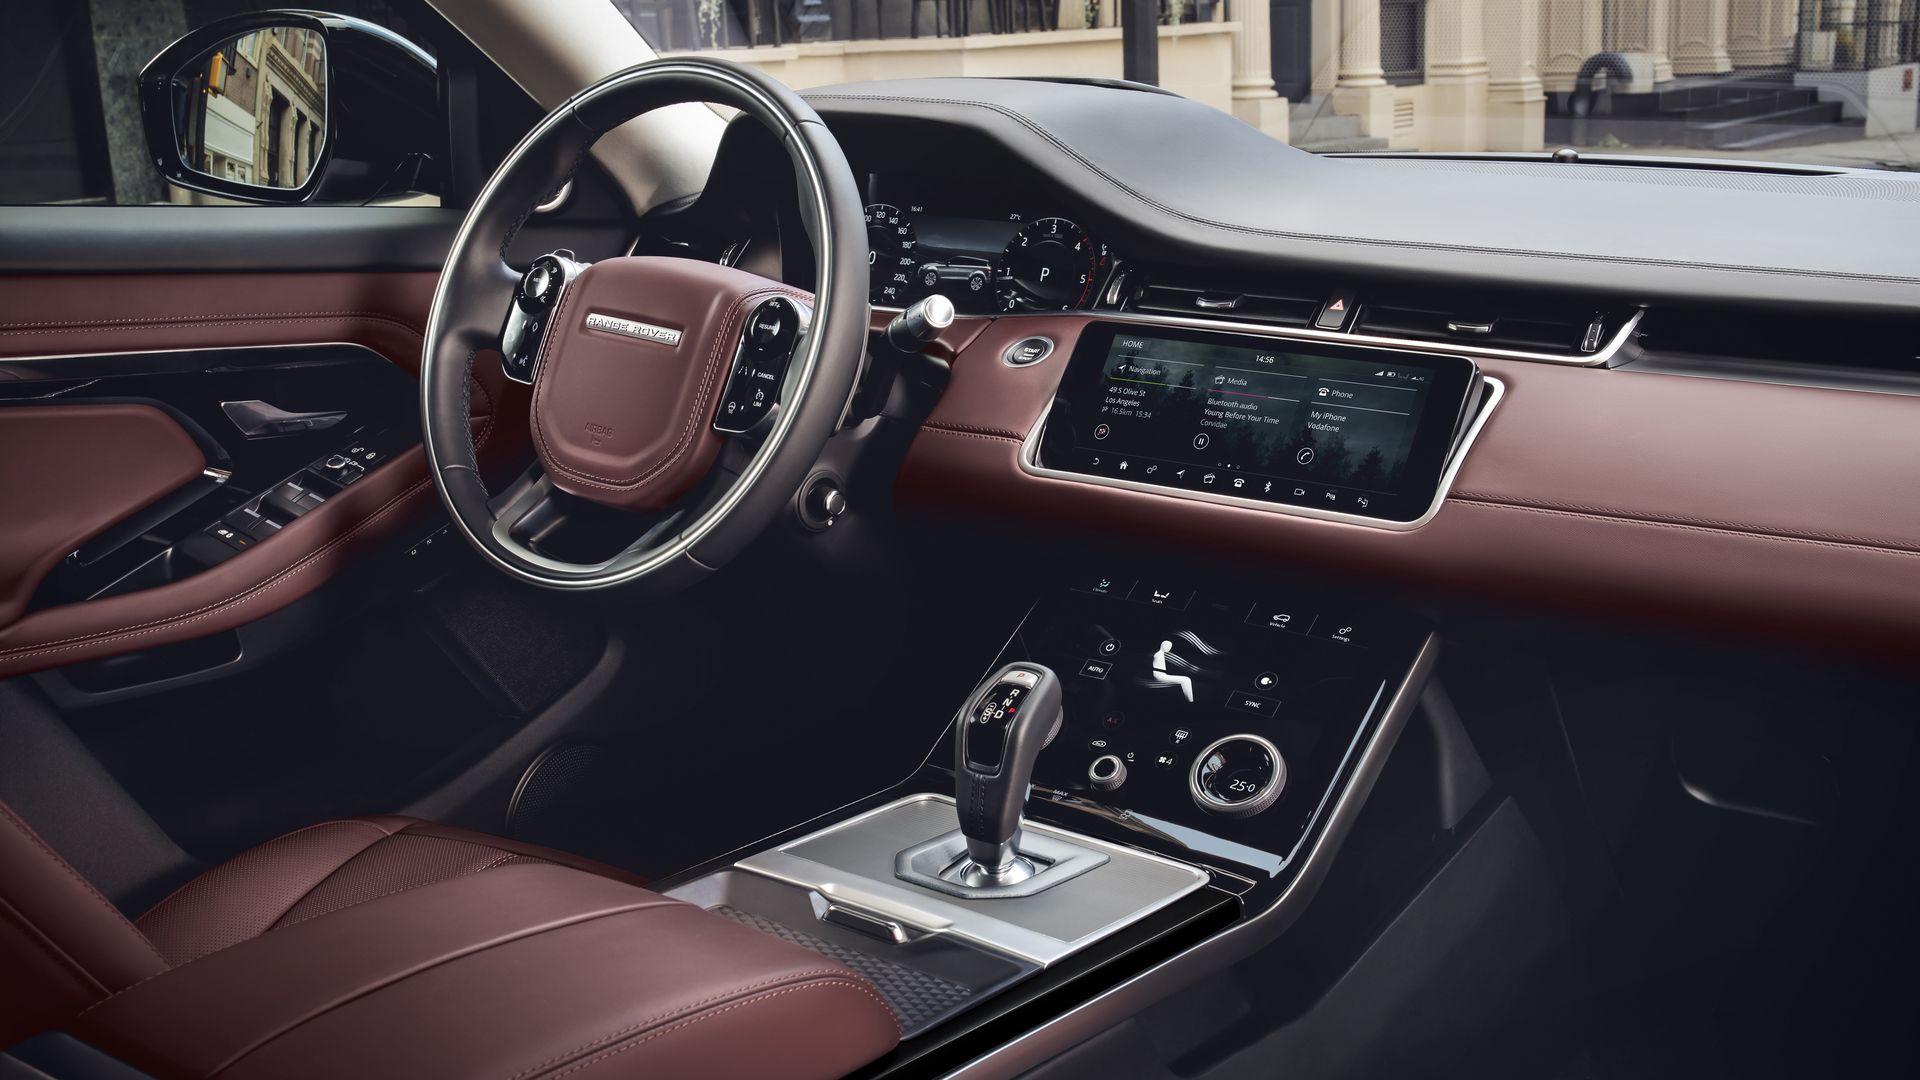 Range Rover Evoque 2020 Interior